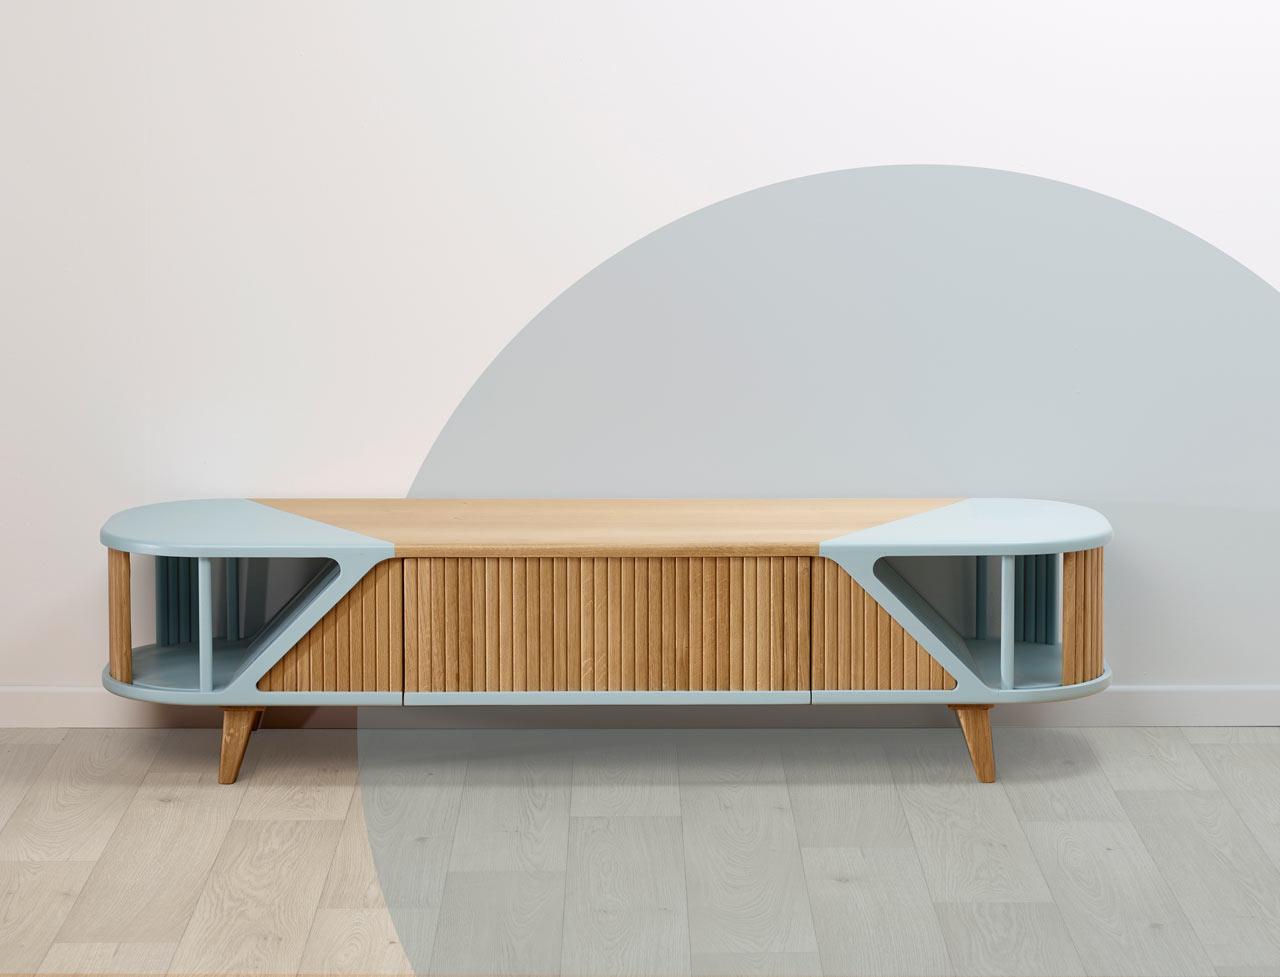 Julie-Gaillard-Latitude-Furniture-hisheji (1)